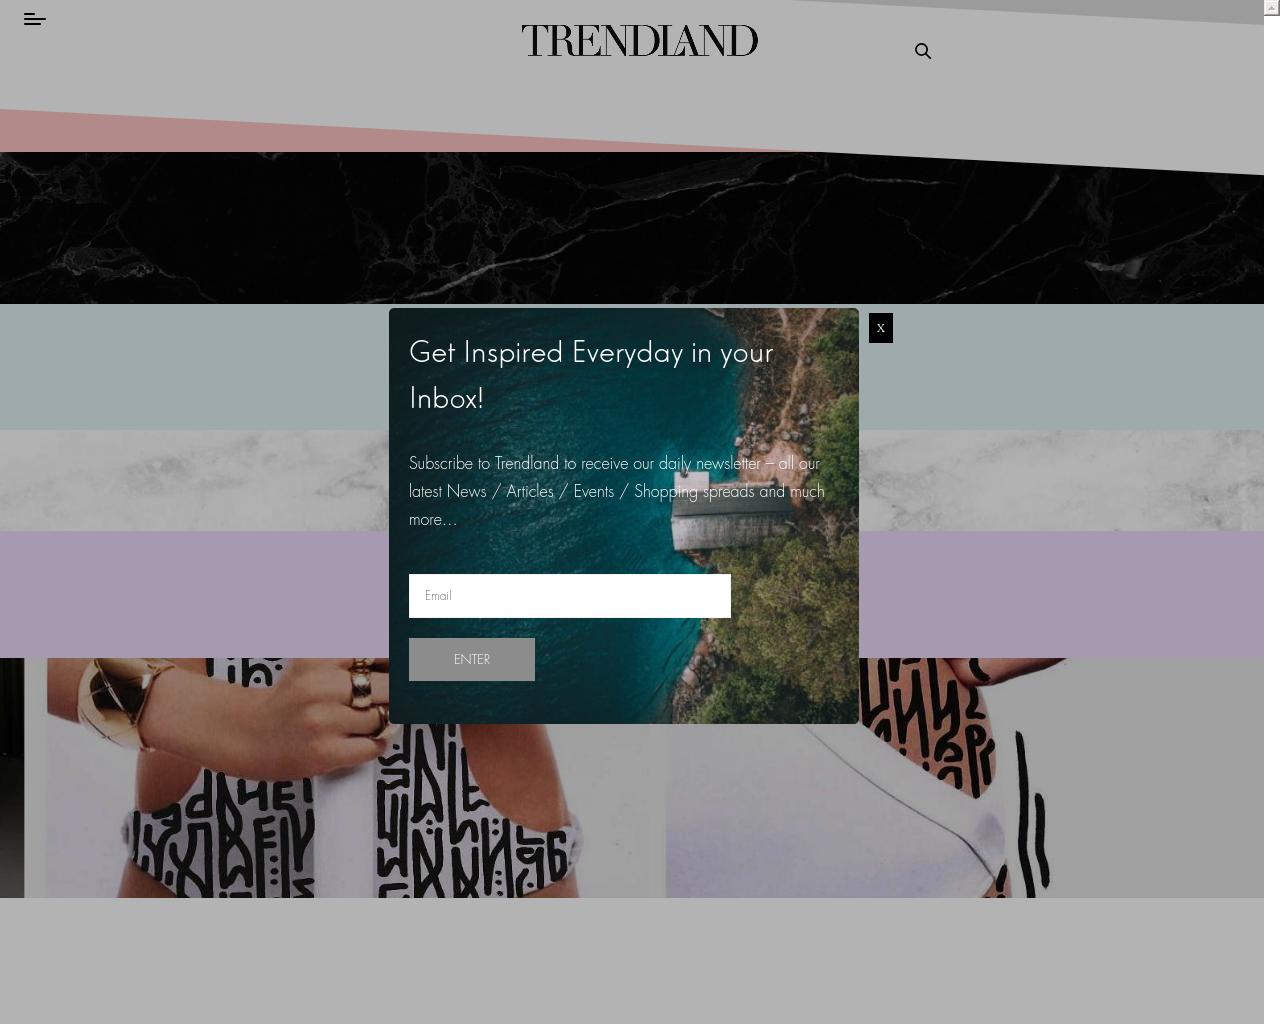 Trendland-Advertising-Reviews-Pricing